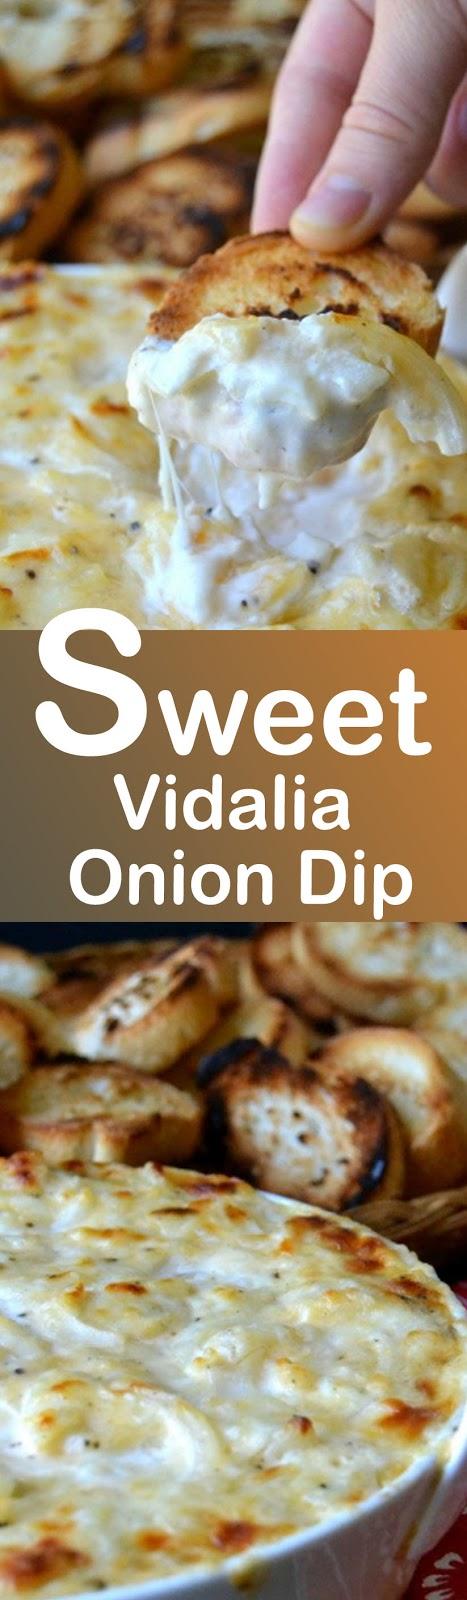 Sweet Vidalia Onion Dip